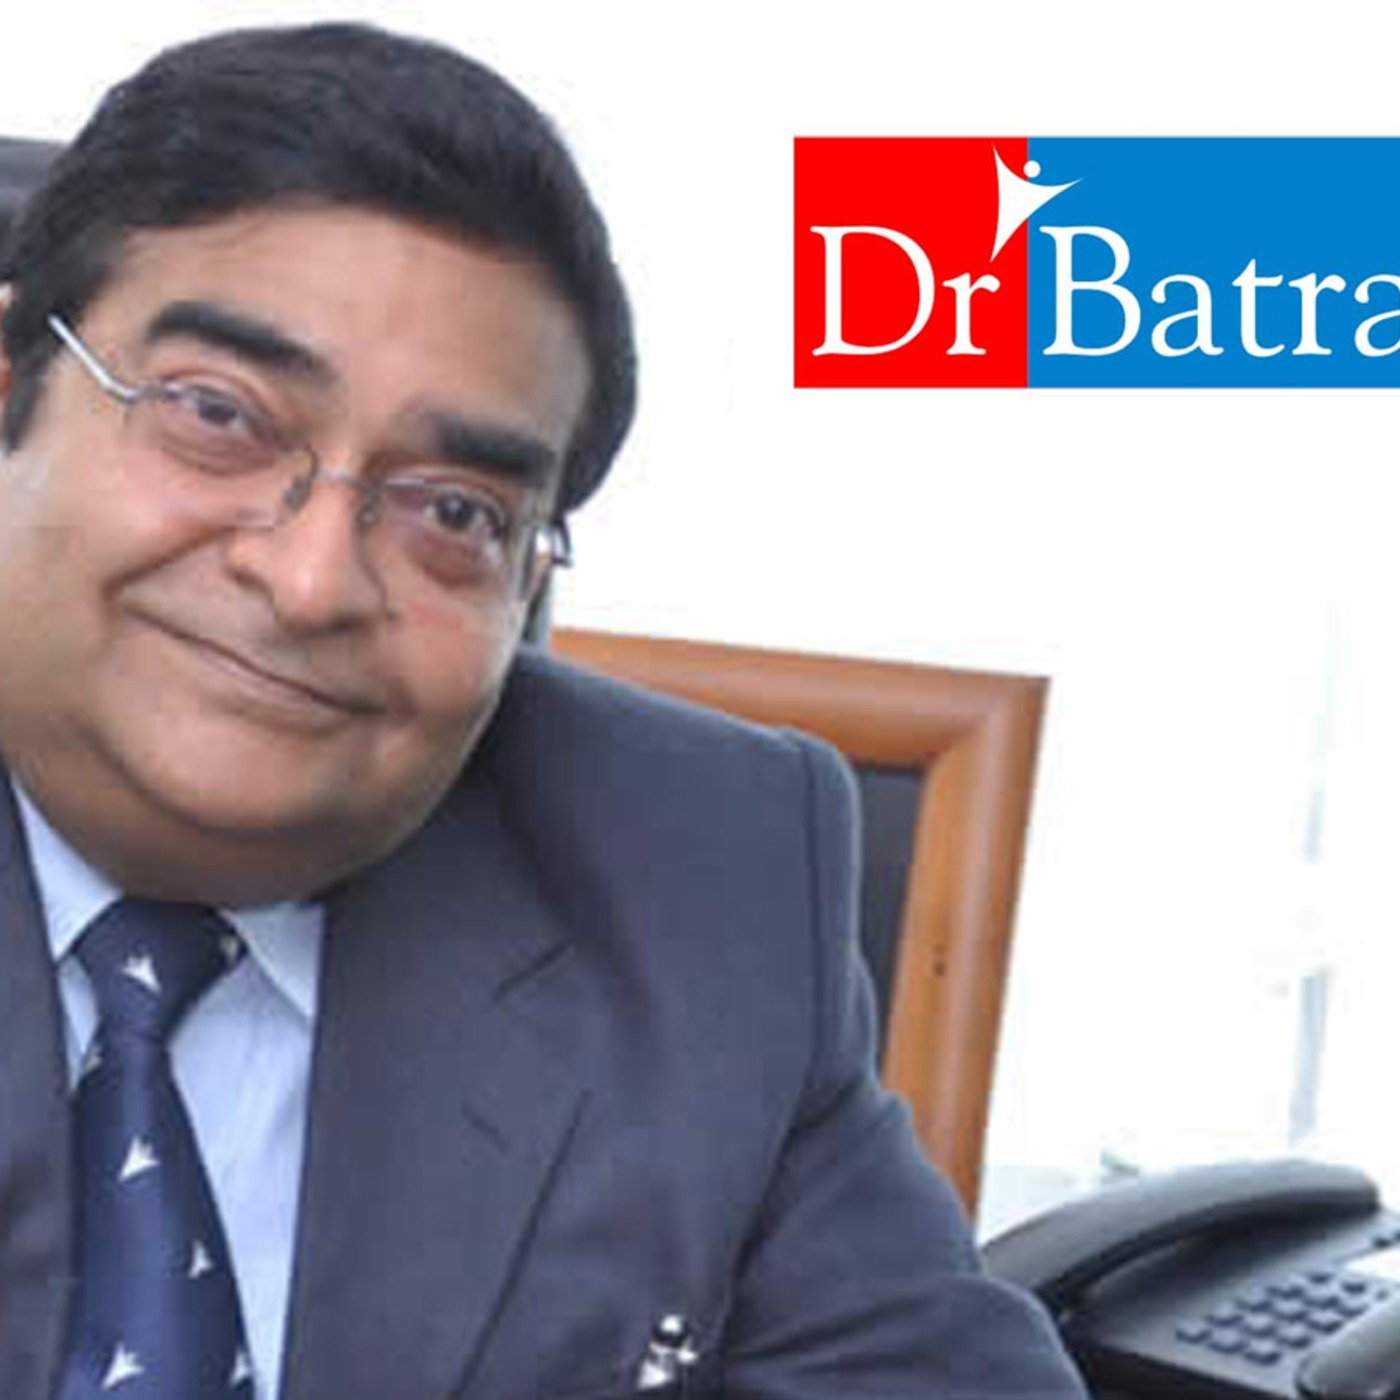 Episode 41: Dr. Mukesh Batra - Homeopath, Entrepreneur, Philanthropist (Part 1 of 2)